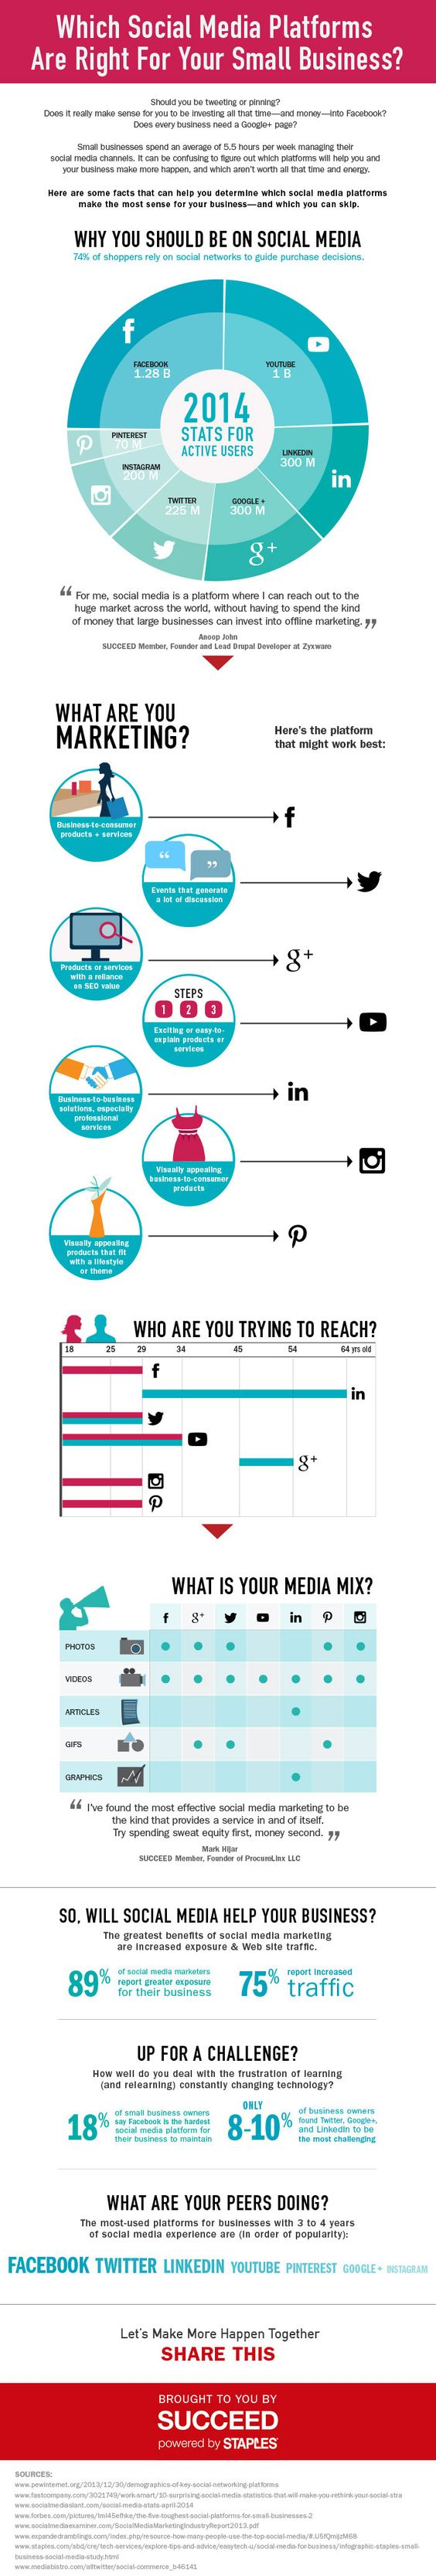 Social Media and Your Small Business image staples social media platform infographic v10